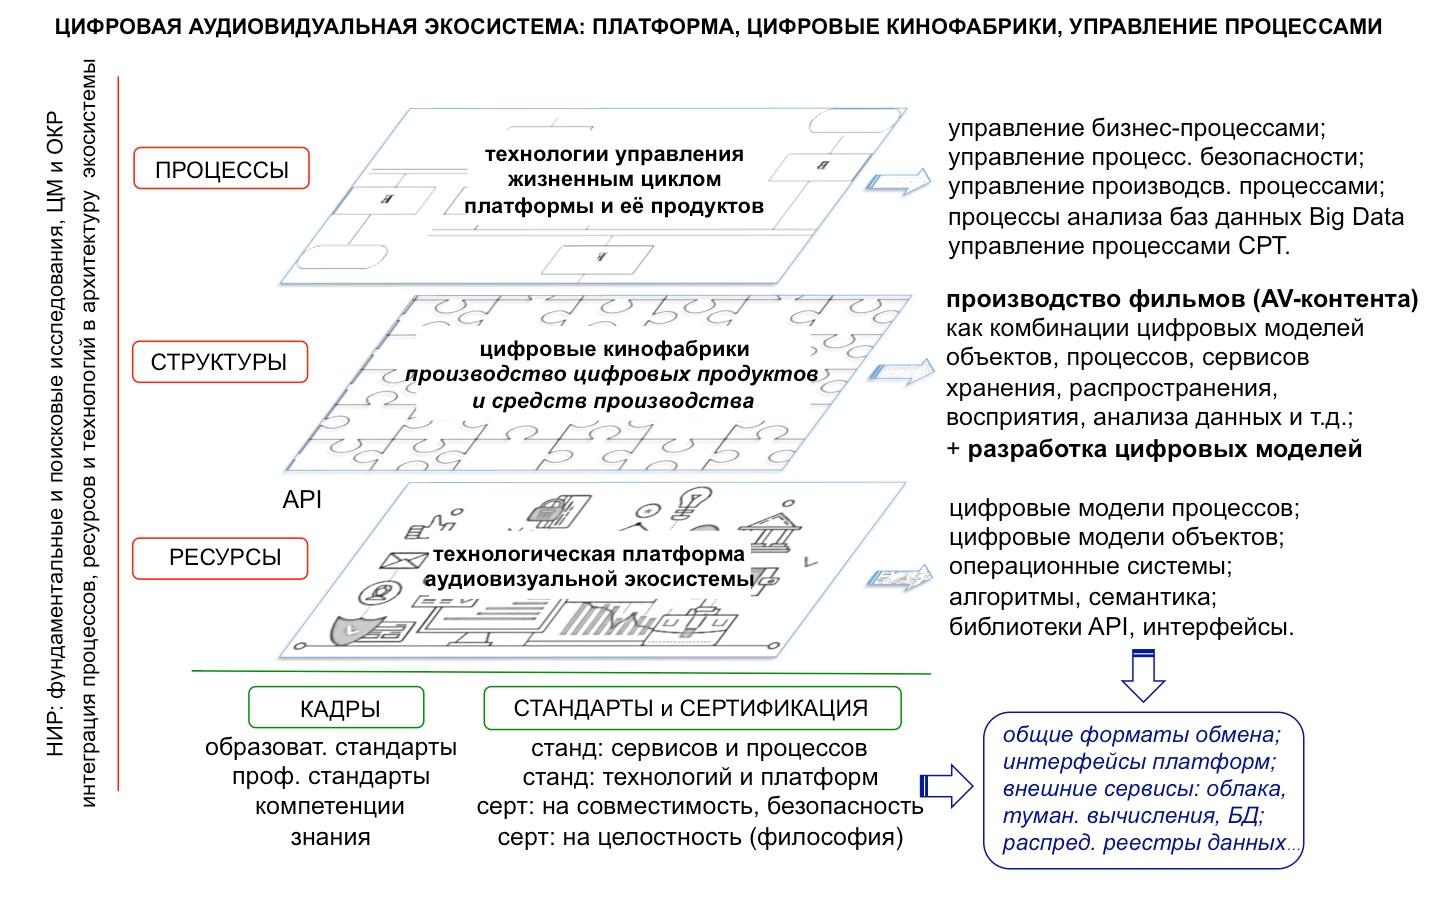 russian_cinema_industry_4_0_4